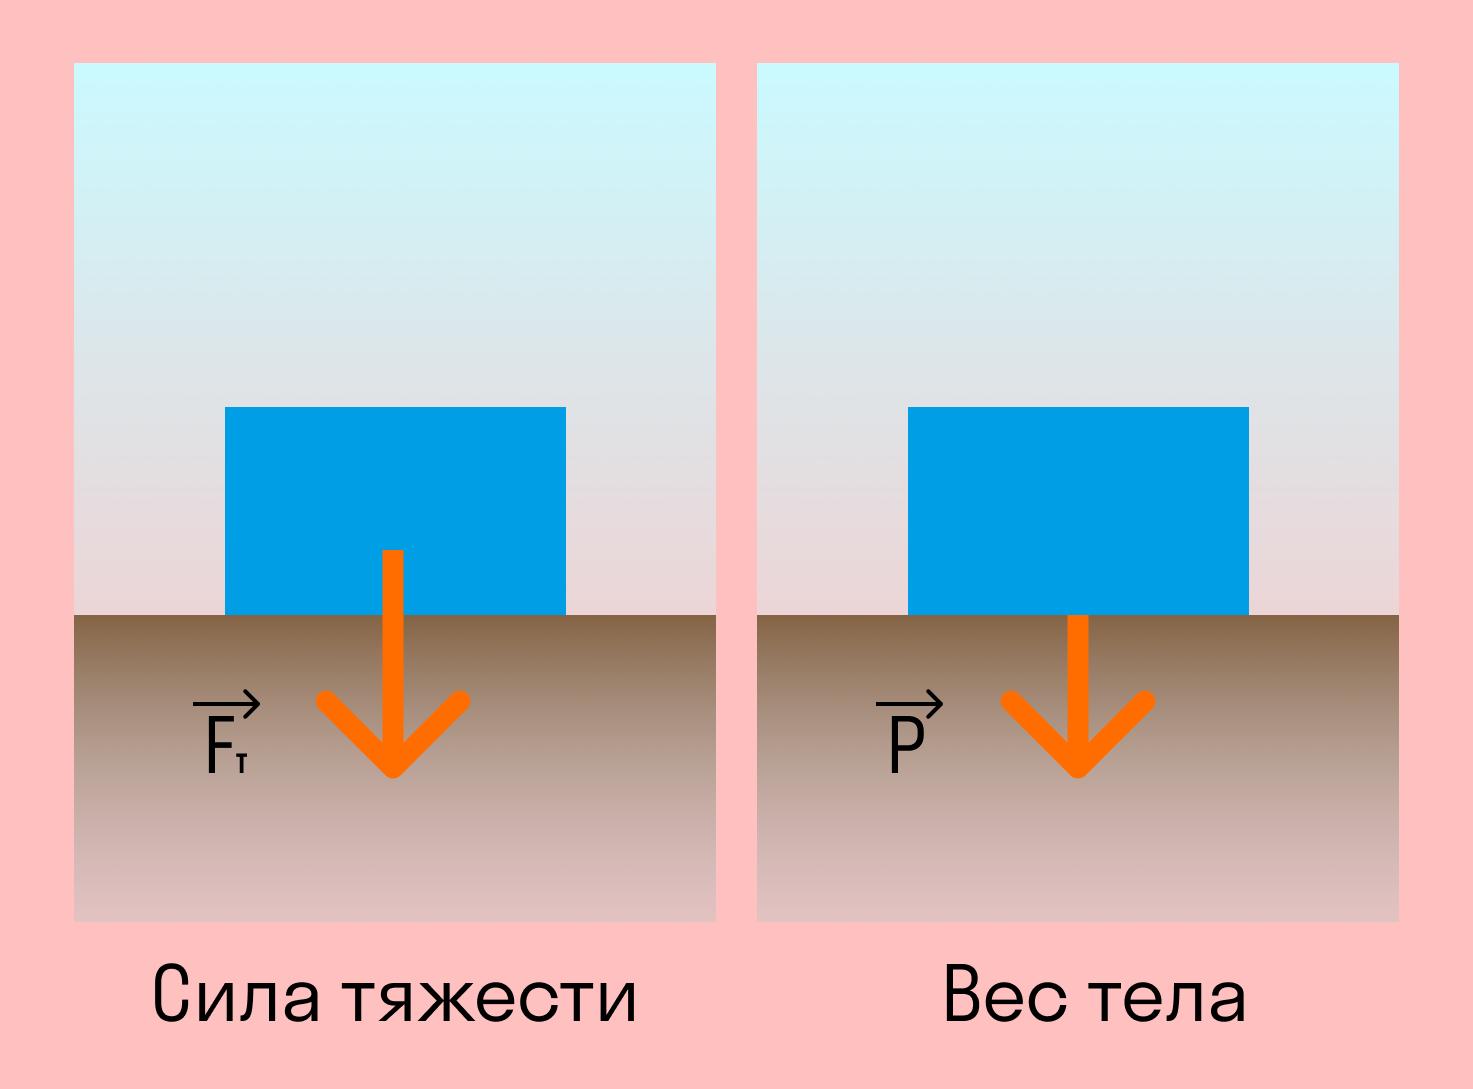 формула сила тяжести и вес тела